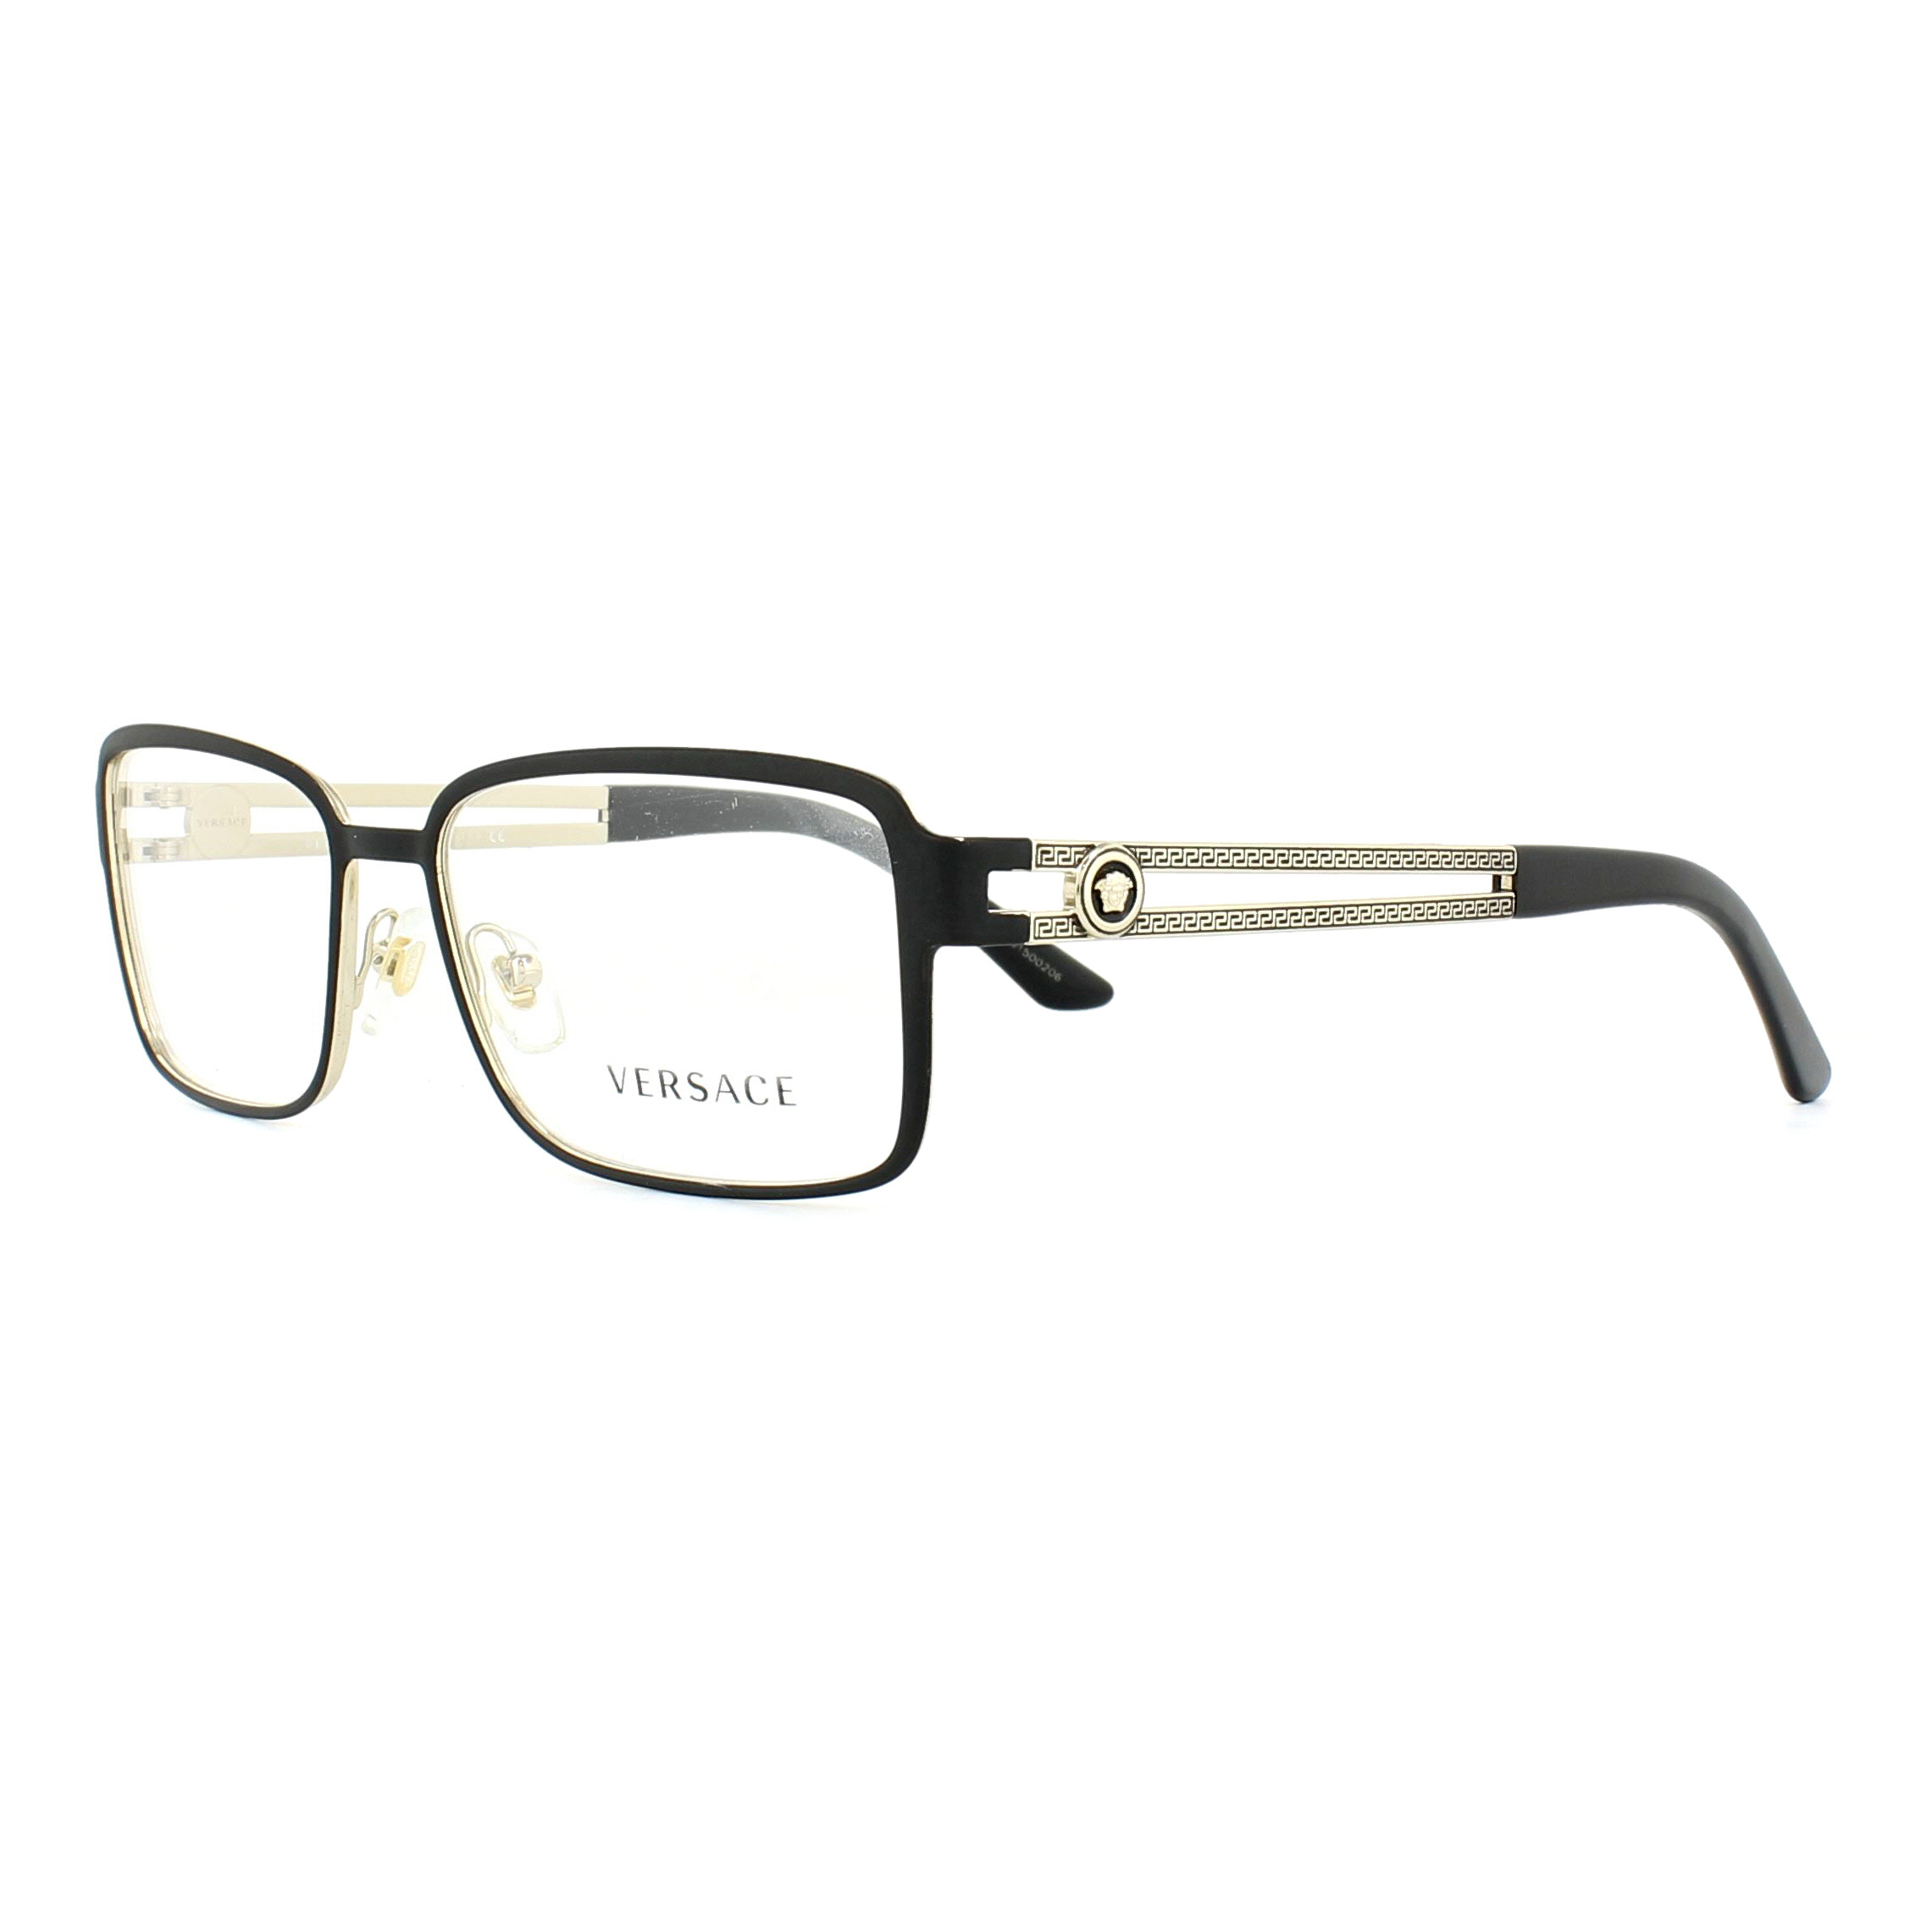 Versace Glasses Frames 1236 1377 Matte Black and Pale Gold 55mm Mens ...